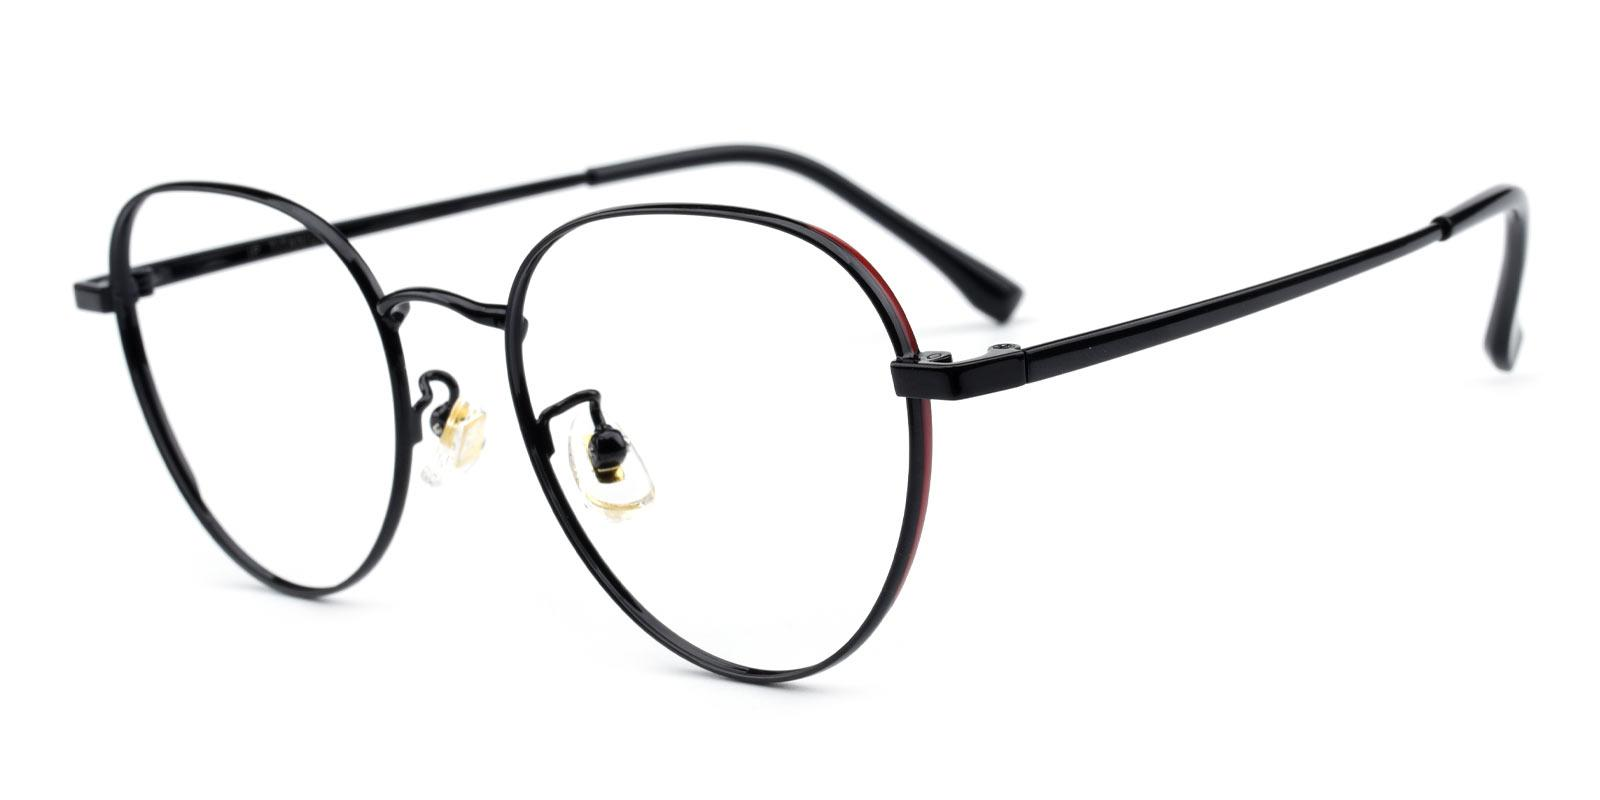 Serina-Black-Round-Titanium-Eyeglasses-additional1